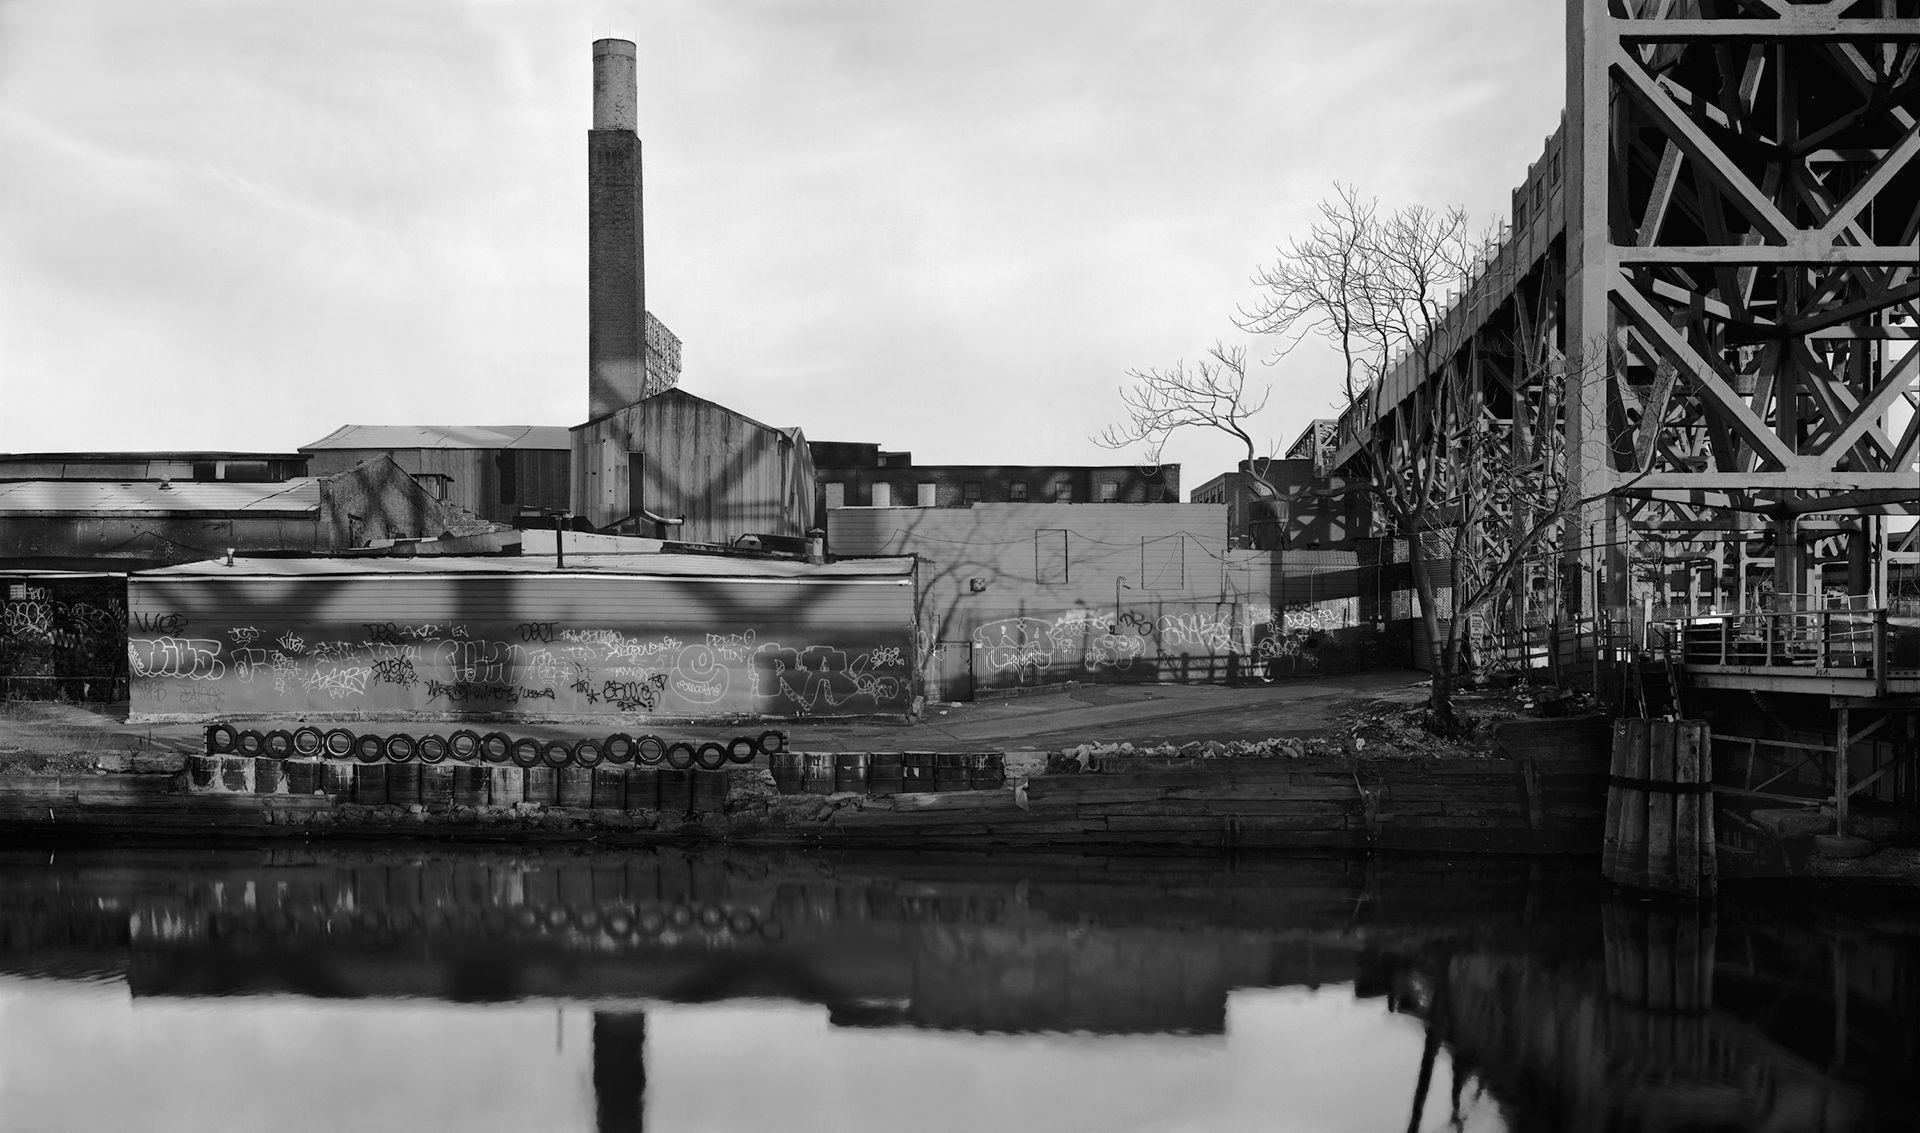 Gowanus Chimney and Viaduct